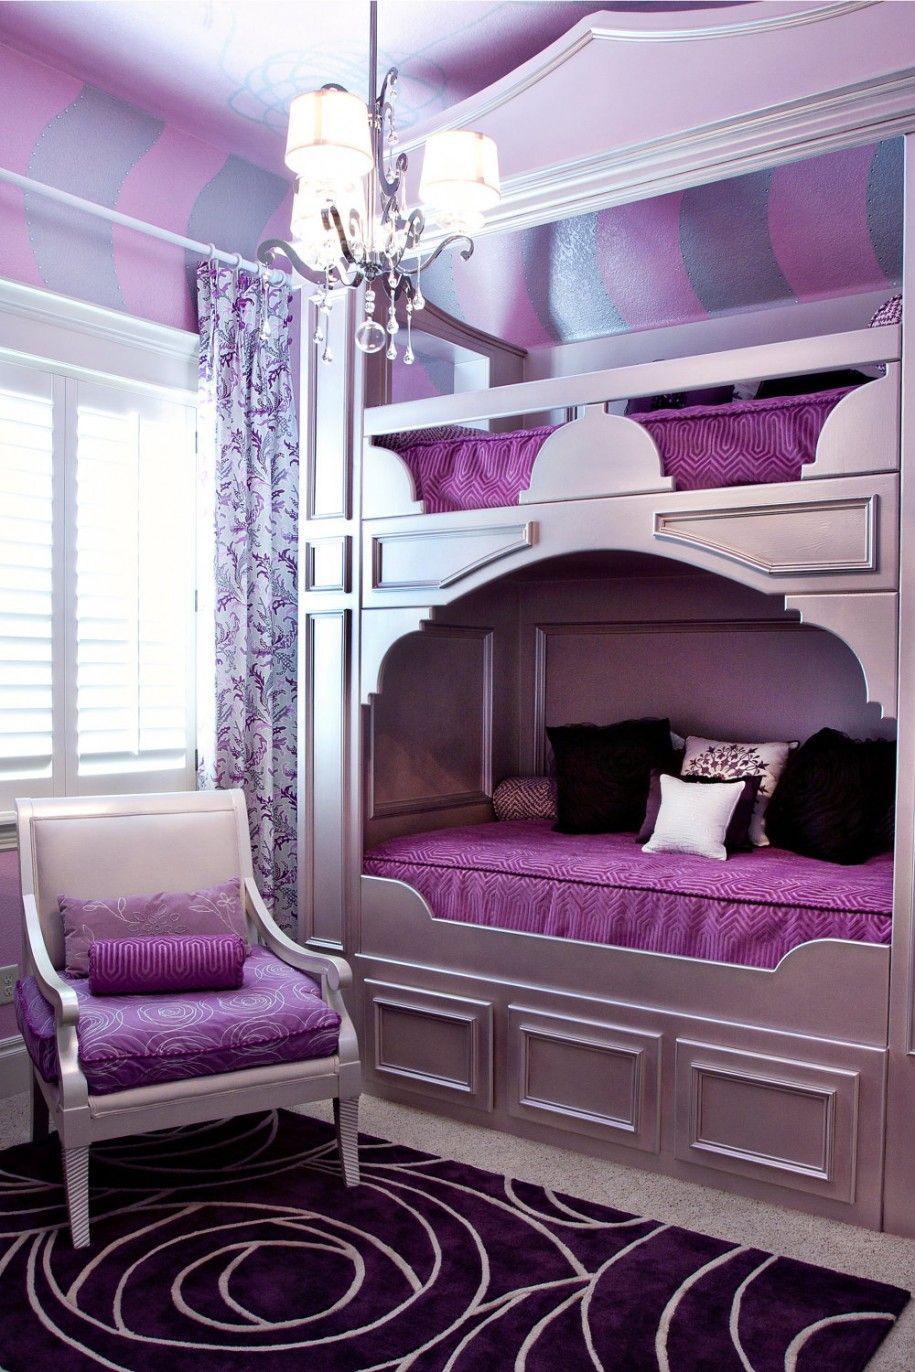 Girls Bunk Beds In Girl Room Girls Bunk Beds Purple Luxury Style